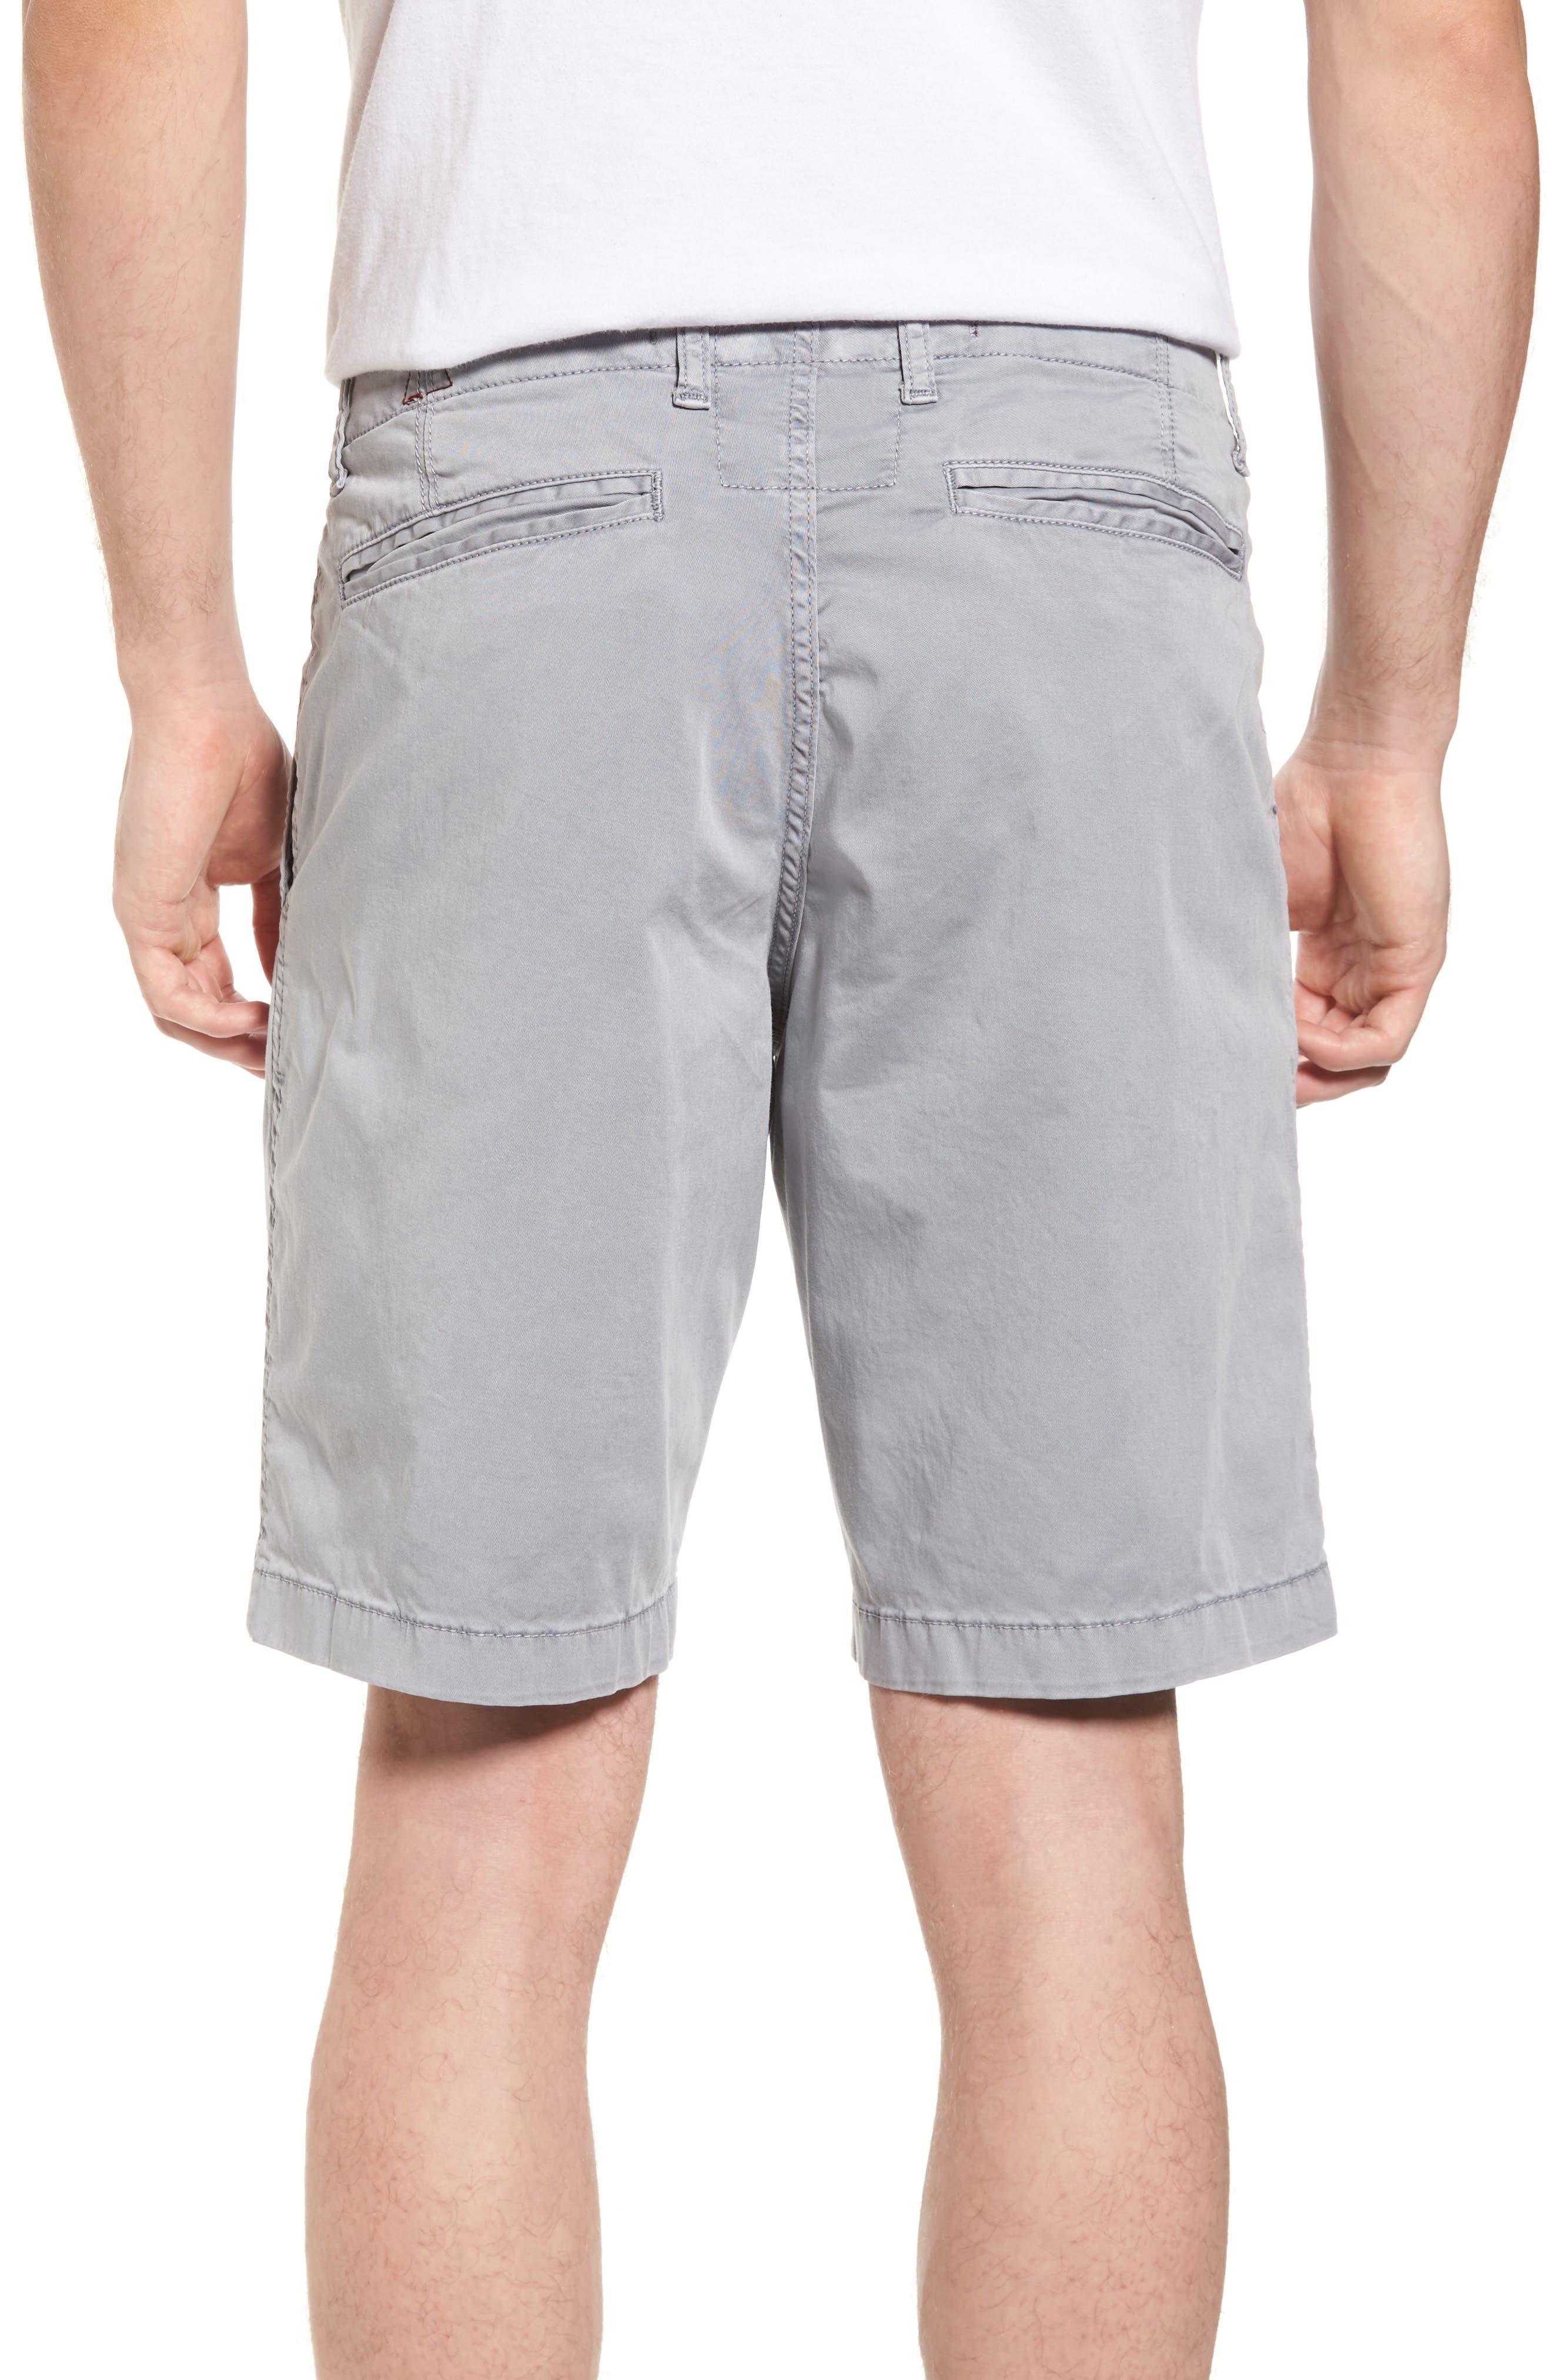 St. Barts Twill Shorts,                             Alternate thumbnail 15, color,